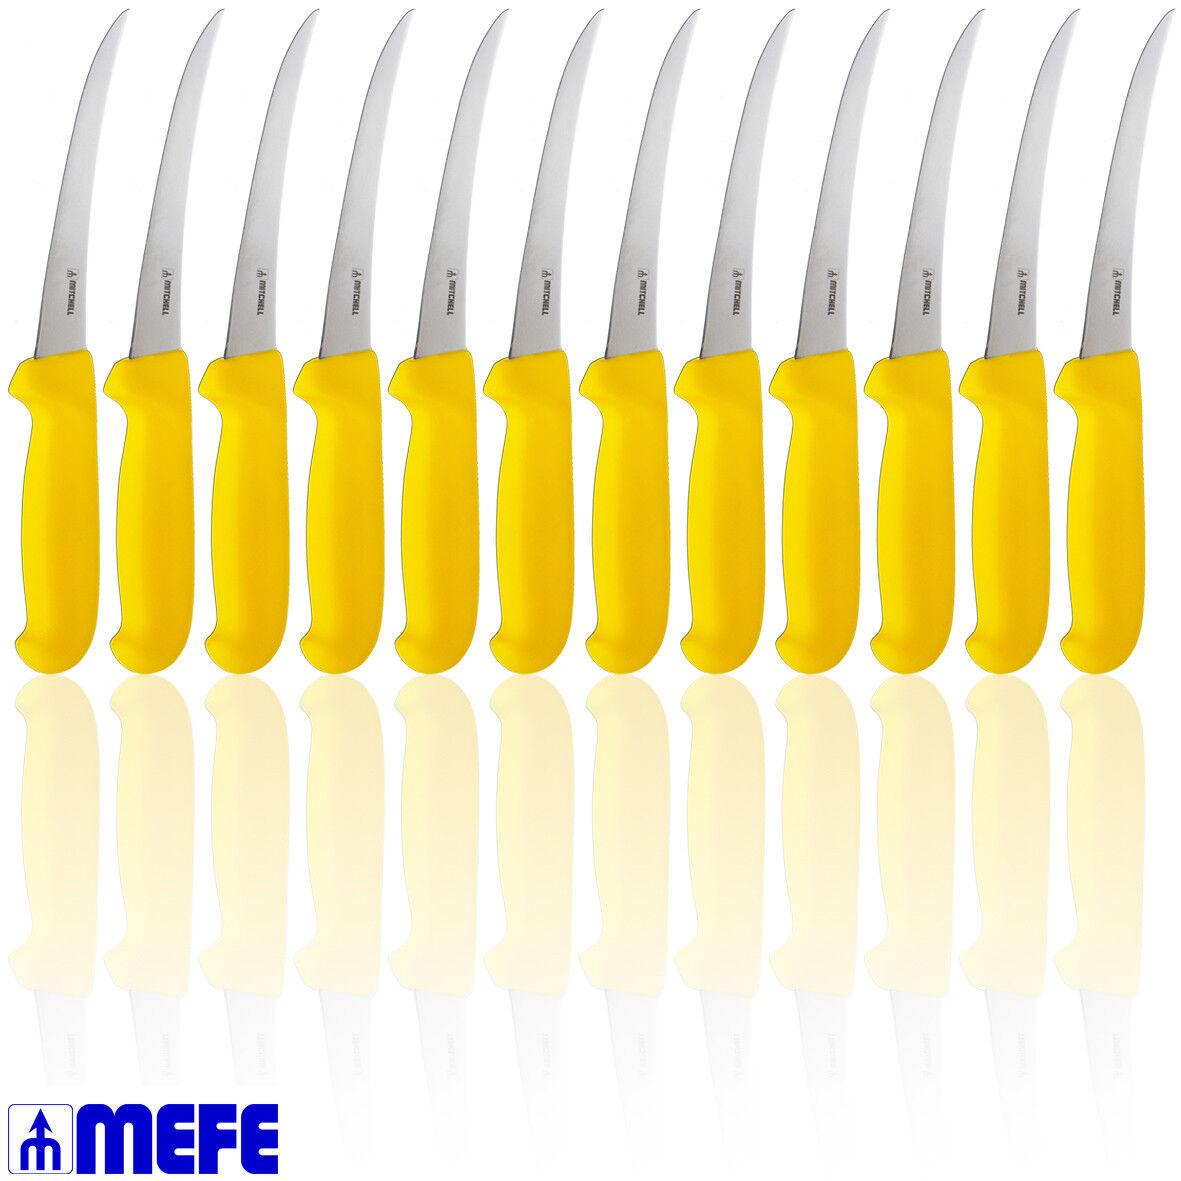 Flexible Curved Boning Knife 6  - Gelb Fibrox - Box of 12 (CAT 1376FFLY x 12)